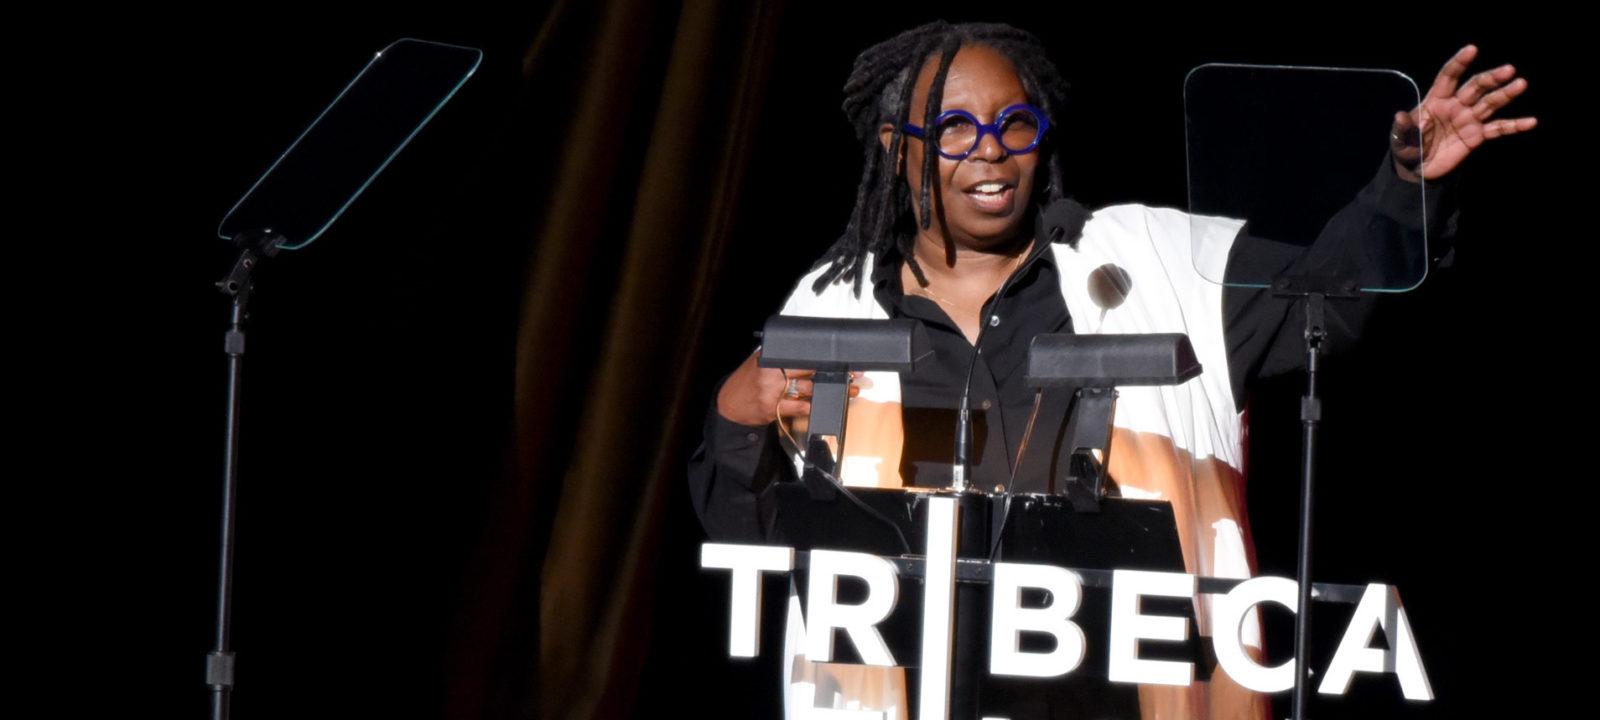 anglo_2000x1125_whoopigoldberg_tribecafilmfestival2017